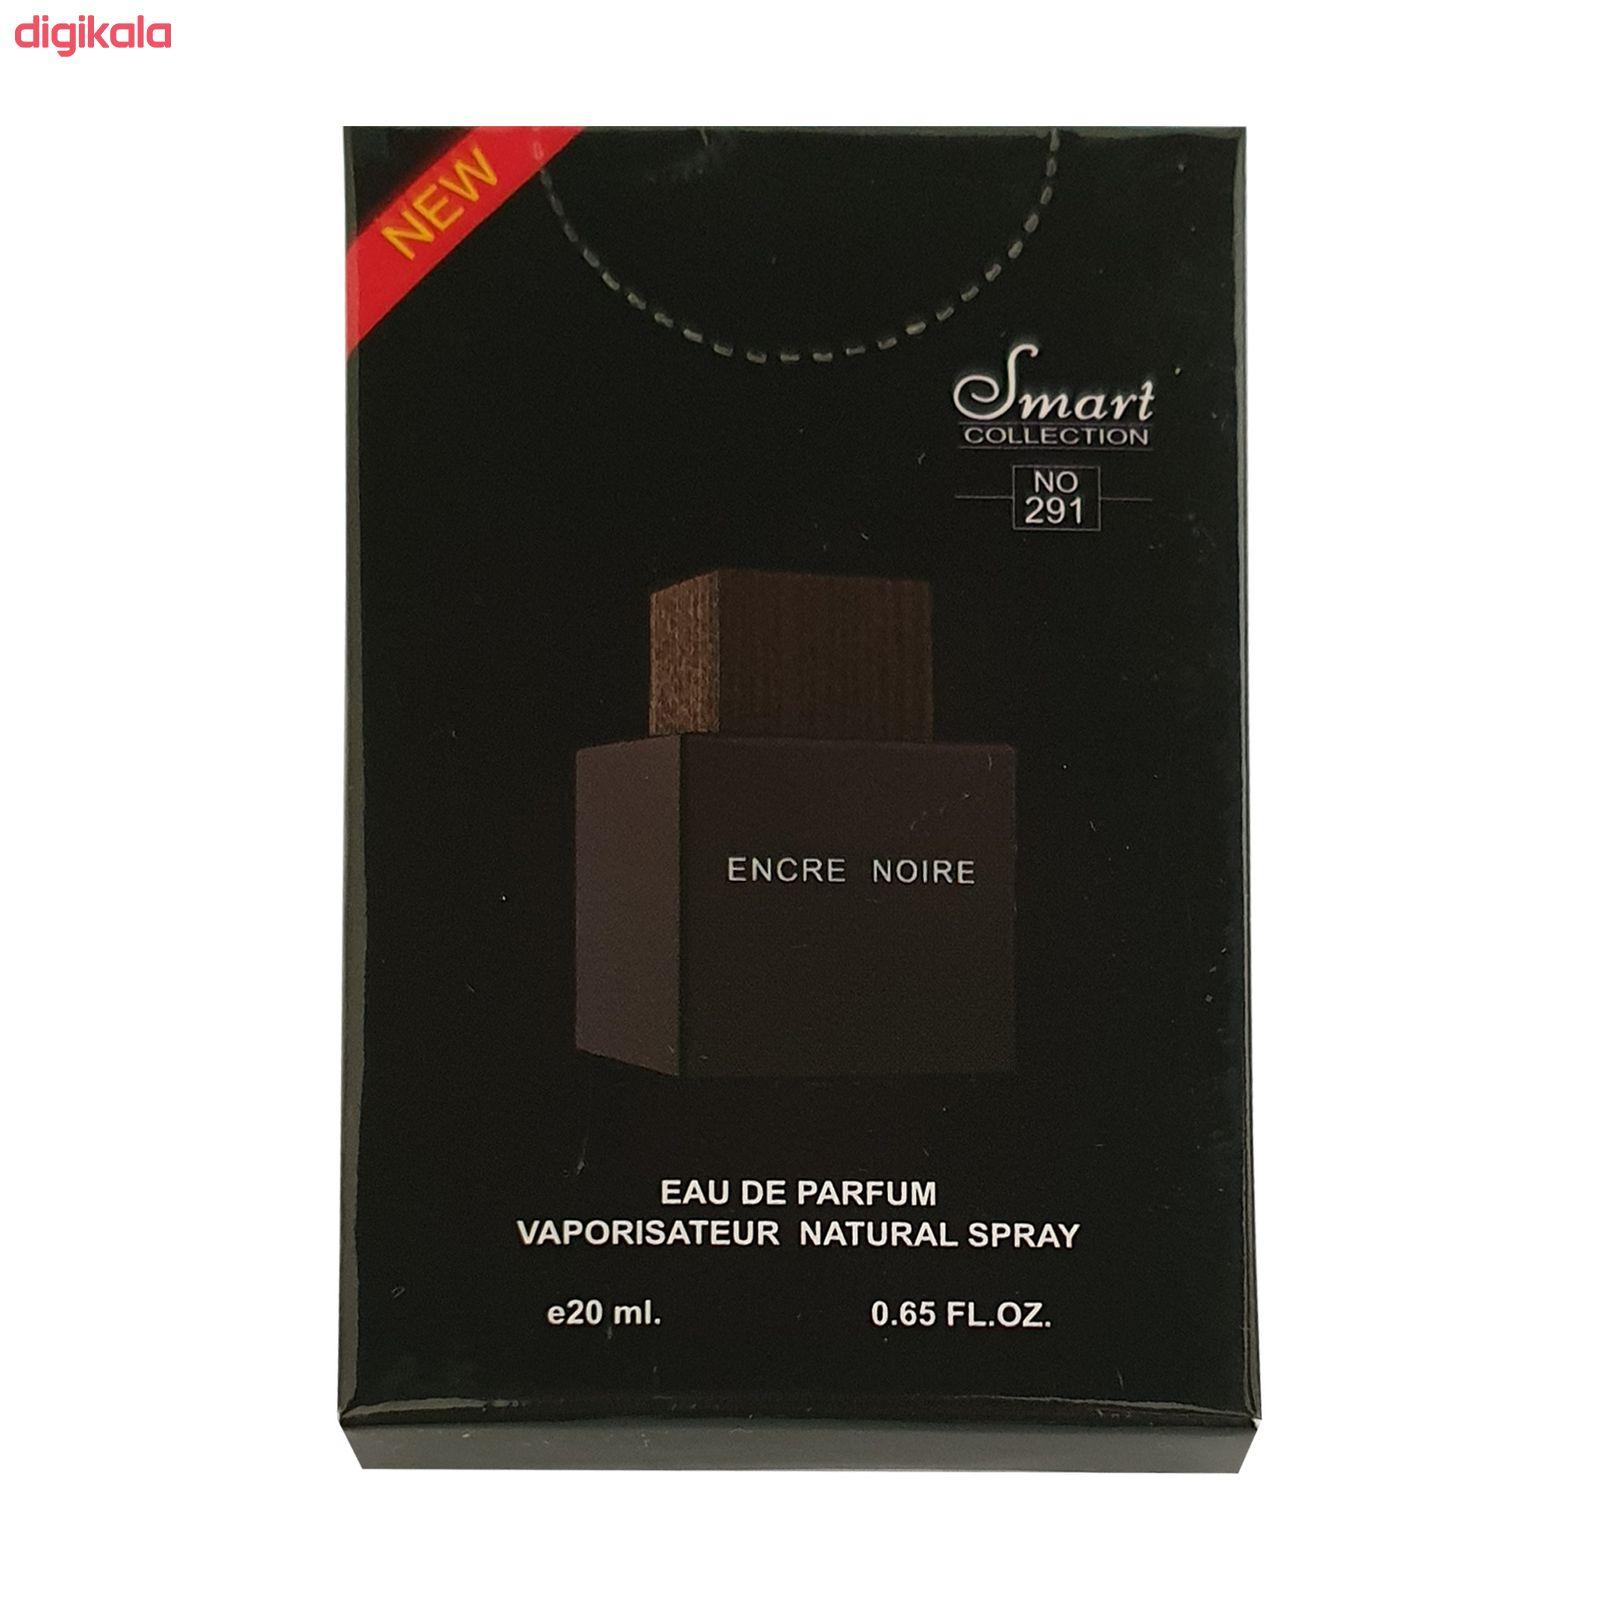 عطر جیبی مردانه اسمارت کالکشن مدل Lalique حجم 20 میلی لیتر main 1 1